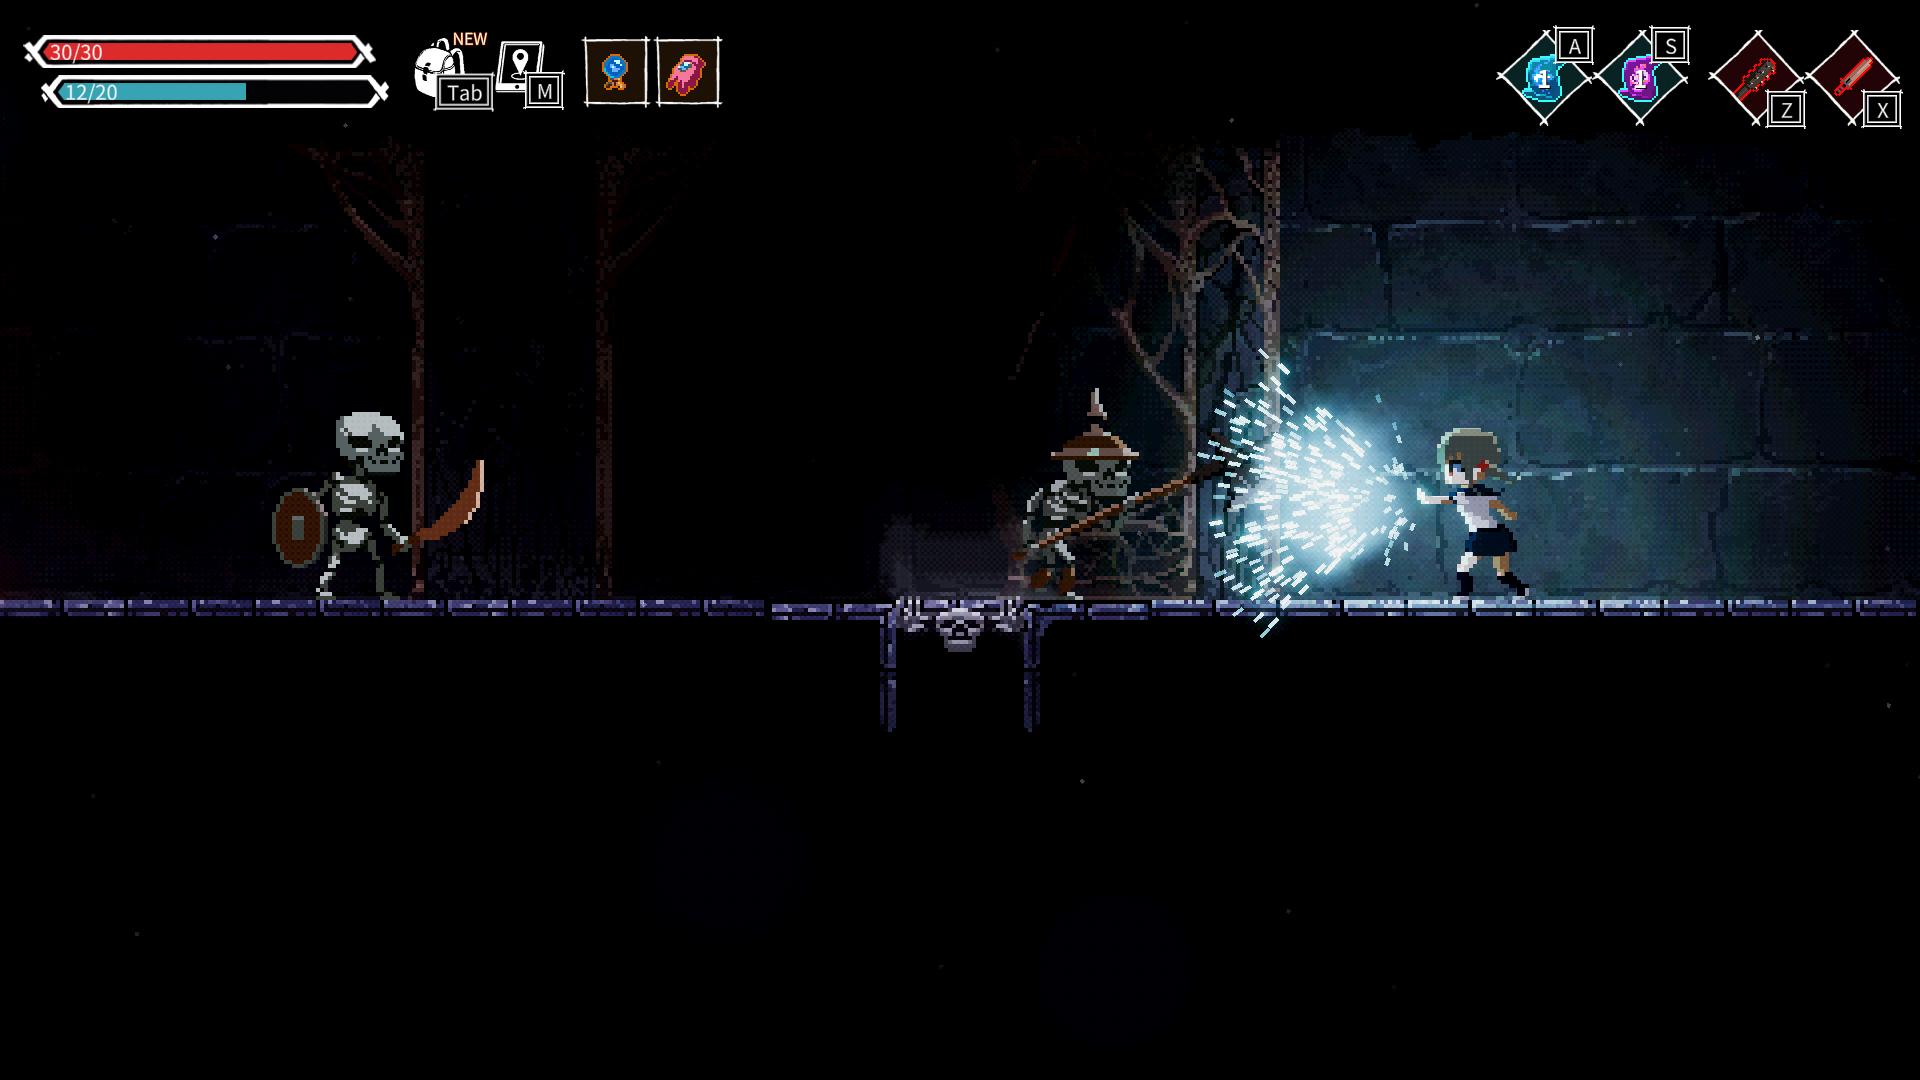 lost-ruins-pc-screenshot-1